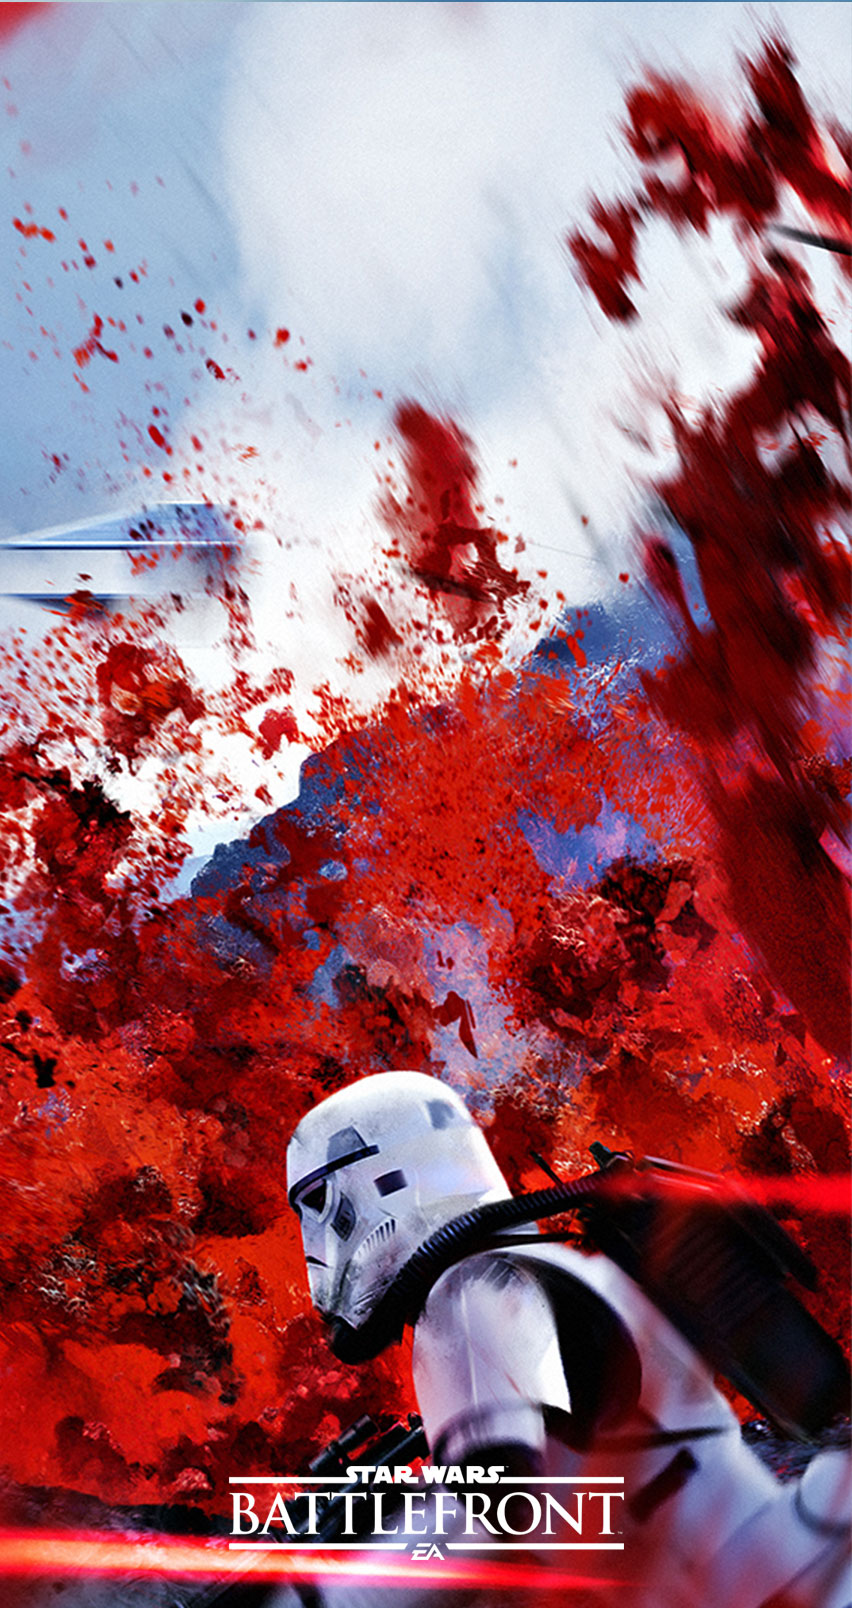 Star Wars Battlefront 2 Wallpaper Iphone Impresionantes Fondos Para Tu Smartphone De Star Wars